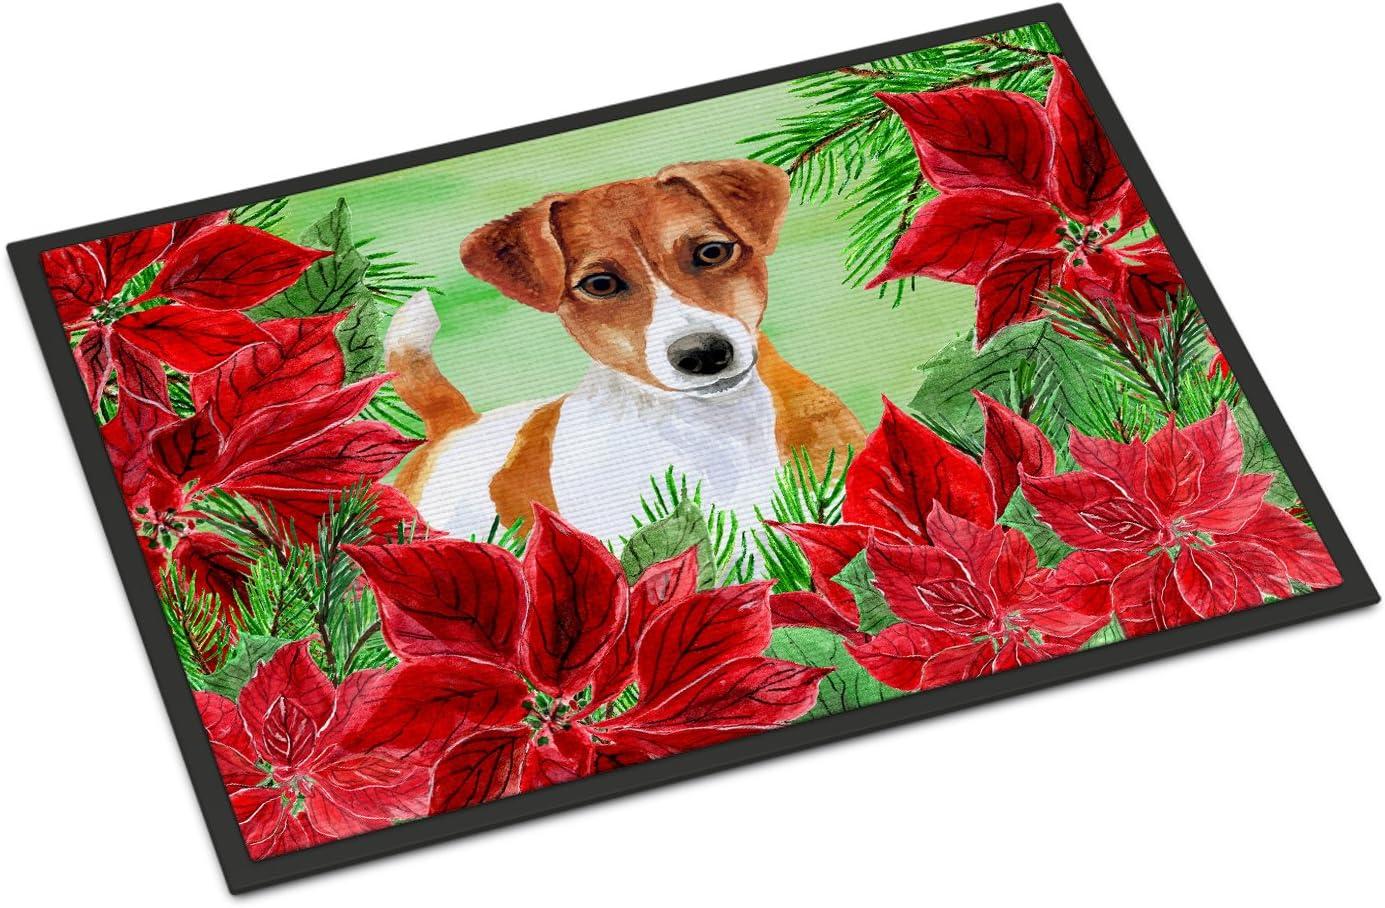 Carolines Treasures Bull Terrier Poinsettias Floor Mat 19 x 27 Multicolor